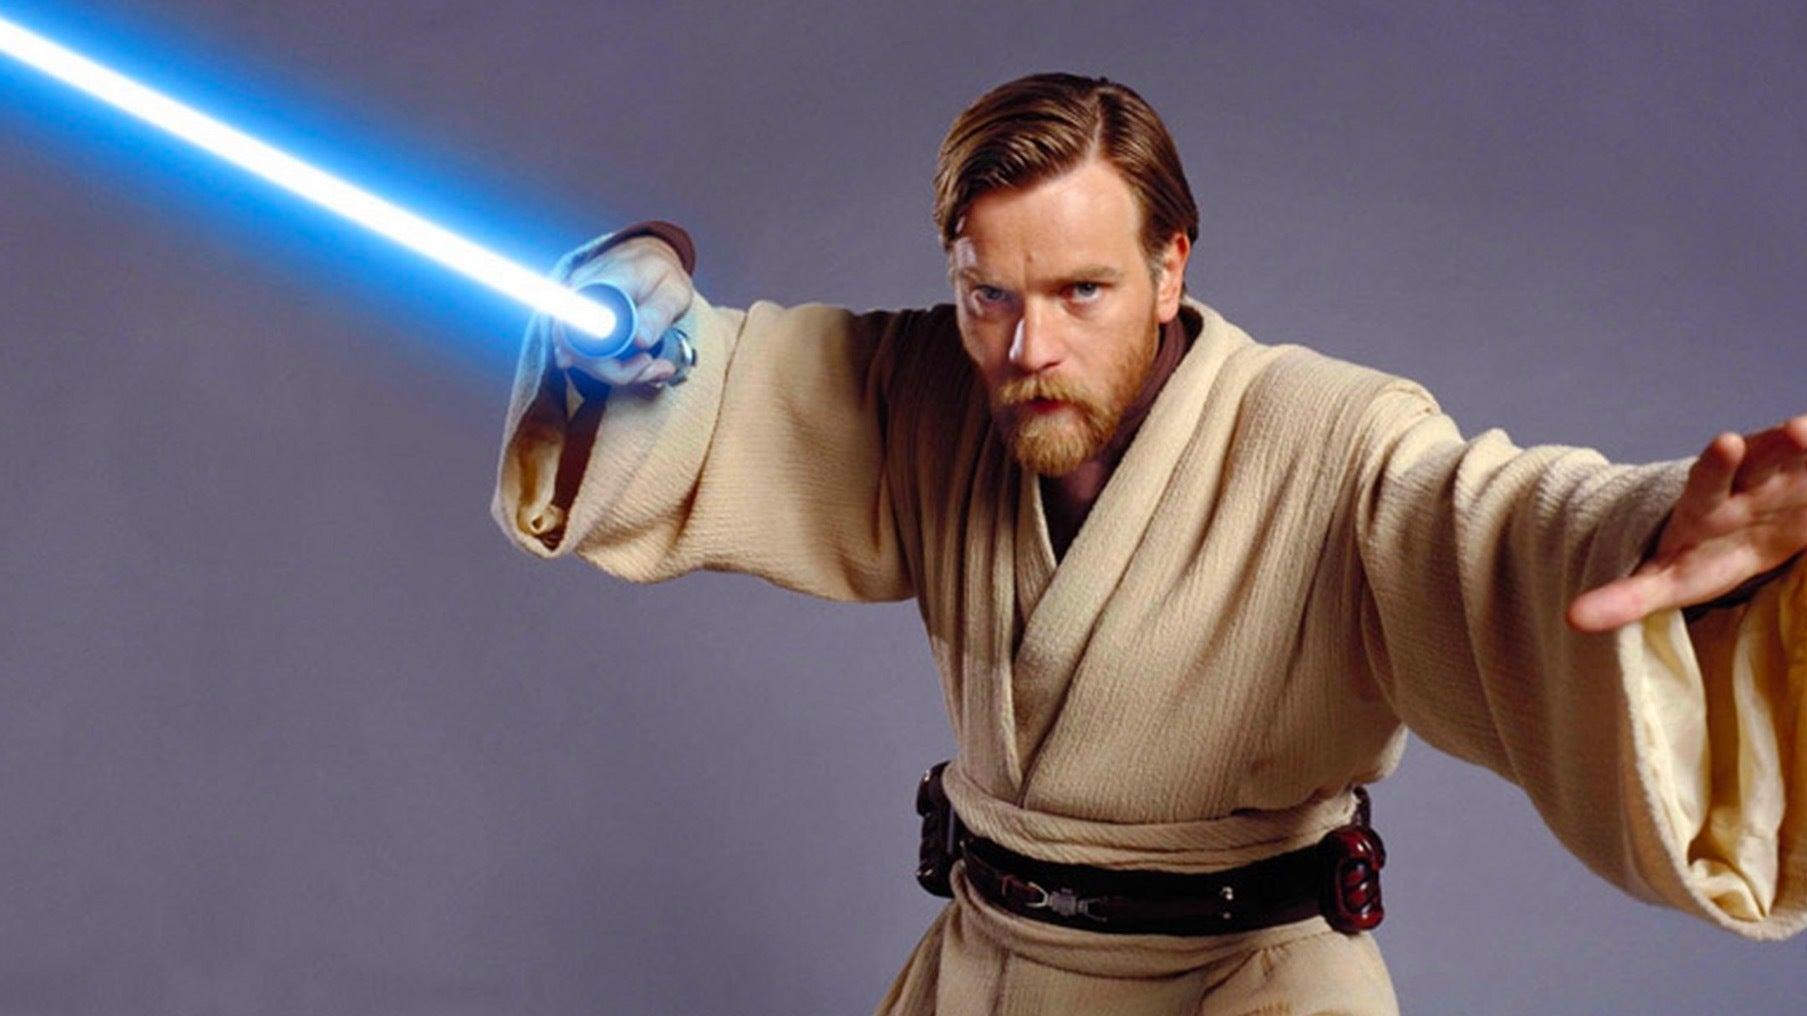 It's Official: An Obi-Wan Kenobi Movie Is In The Works